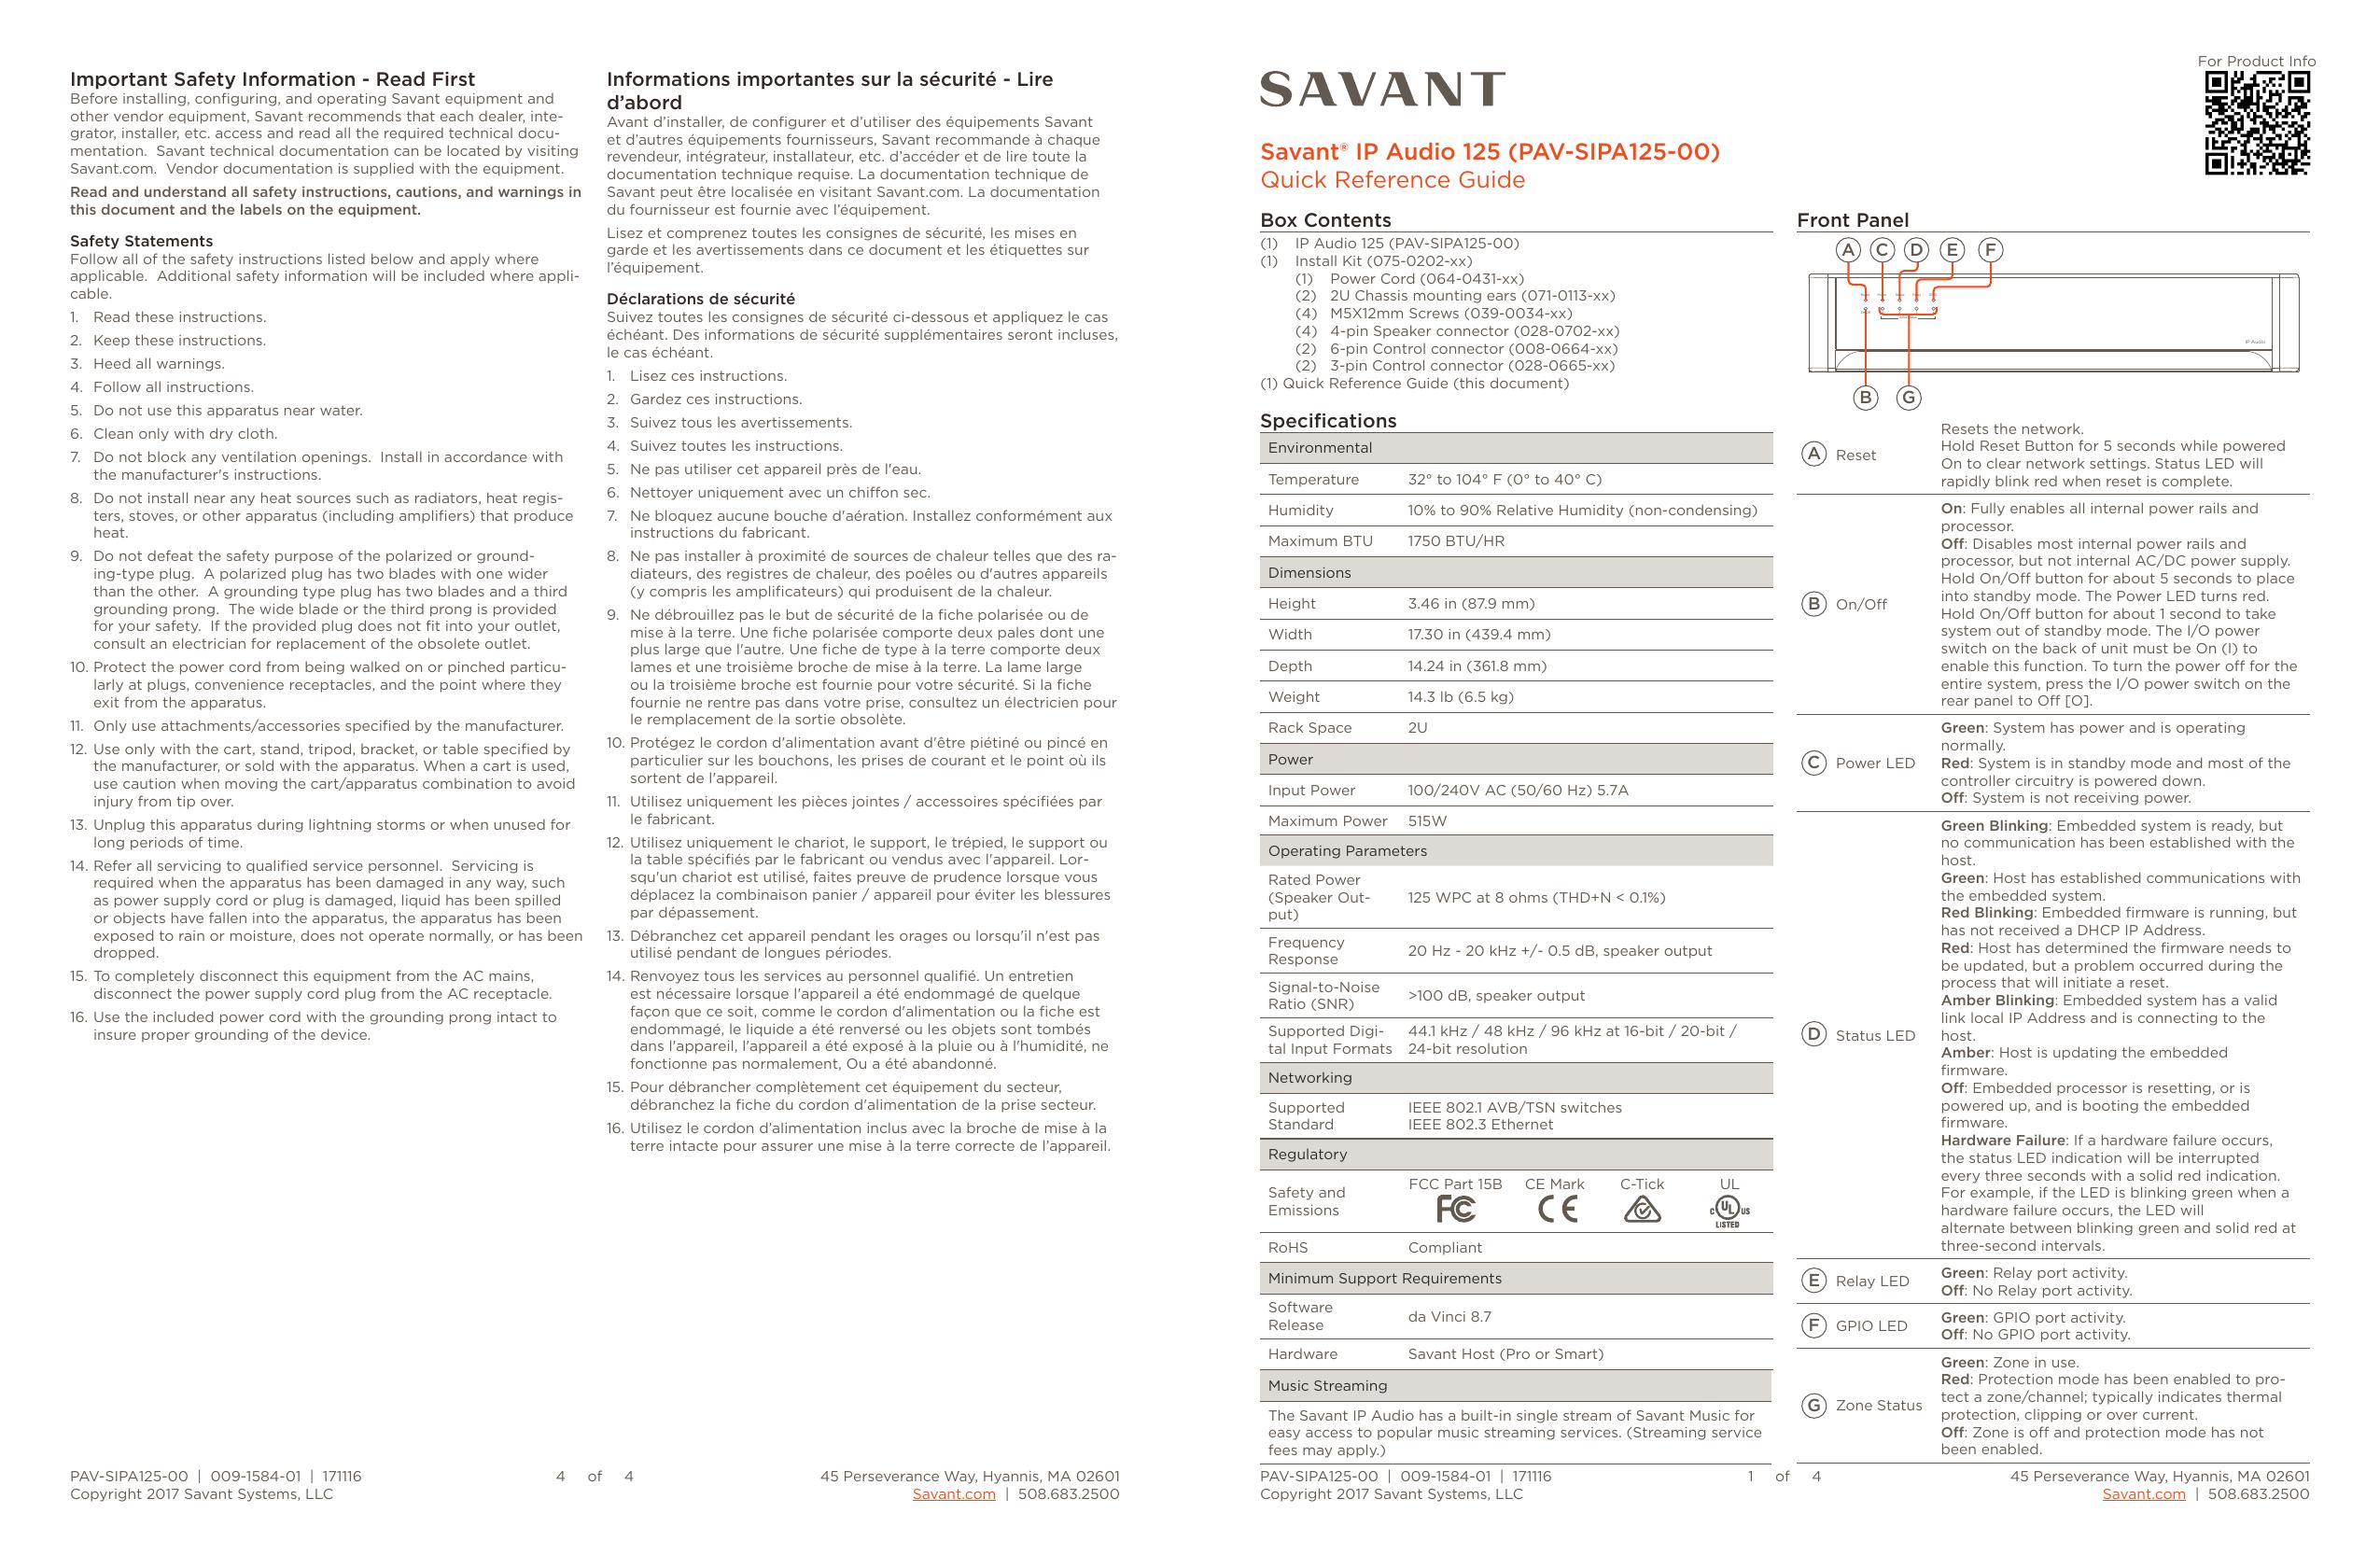 Savant Home Audio Wiring Diagram | Wiring Liry on